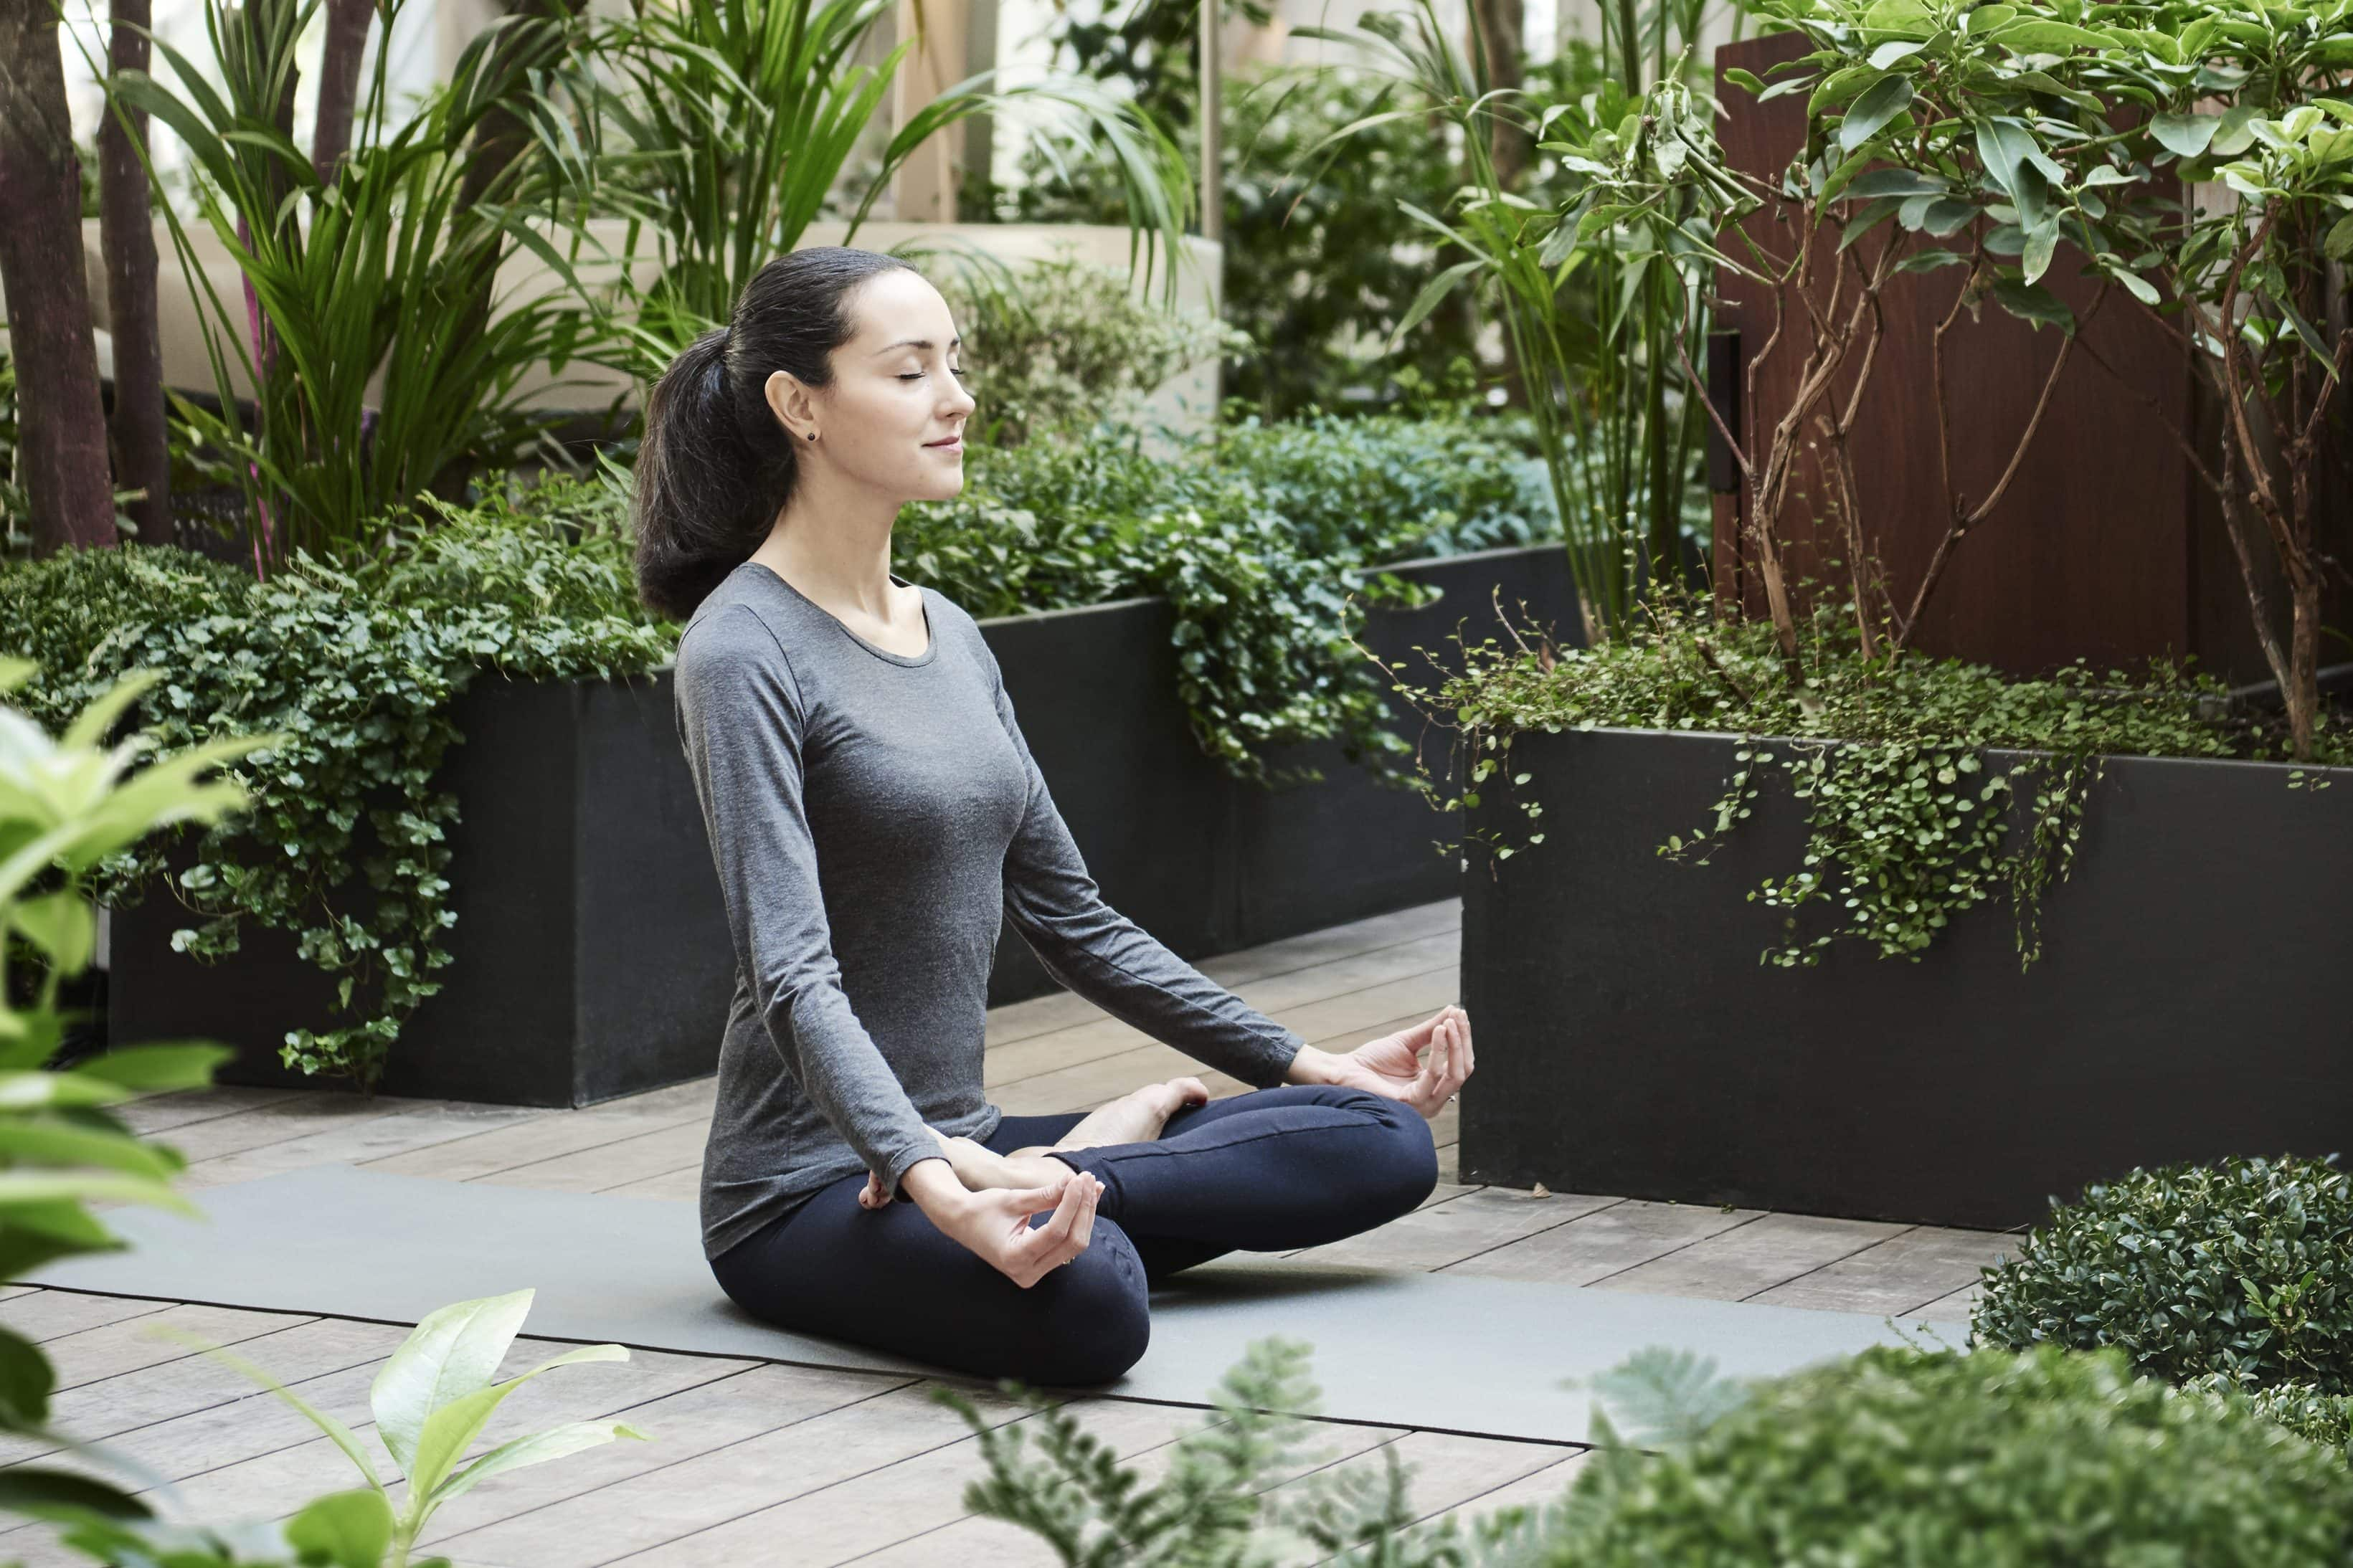 Woman practising yoga in the garden at Mandarin Oriental, Paris